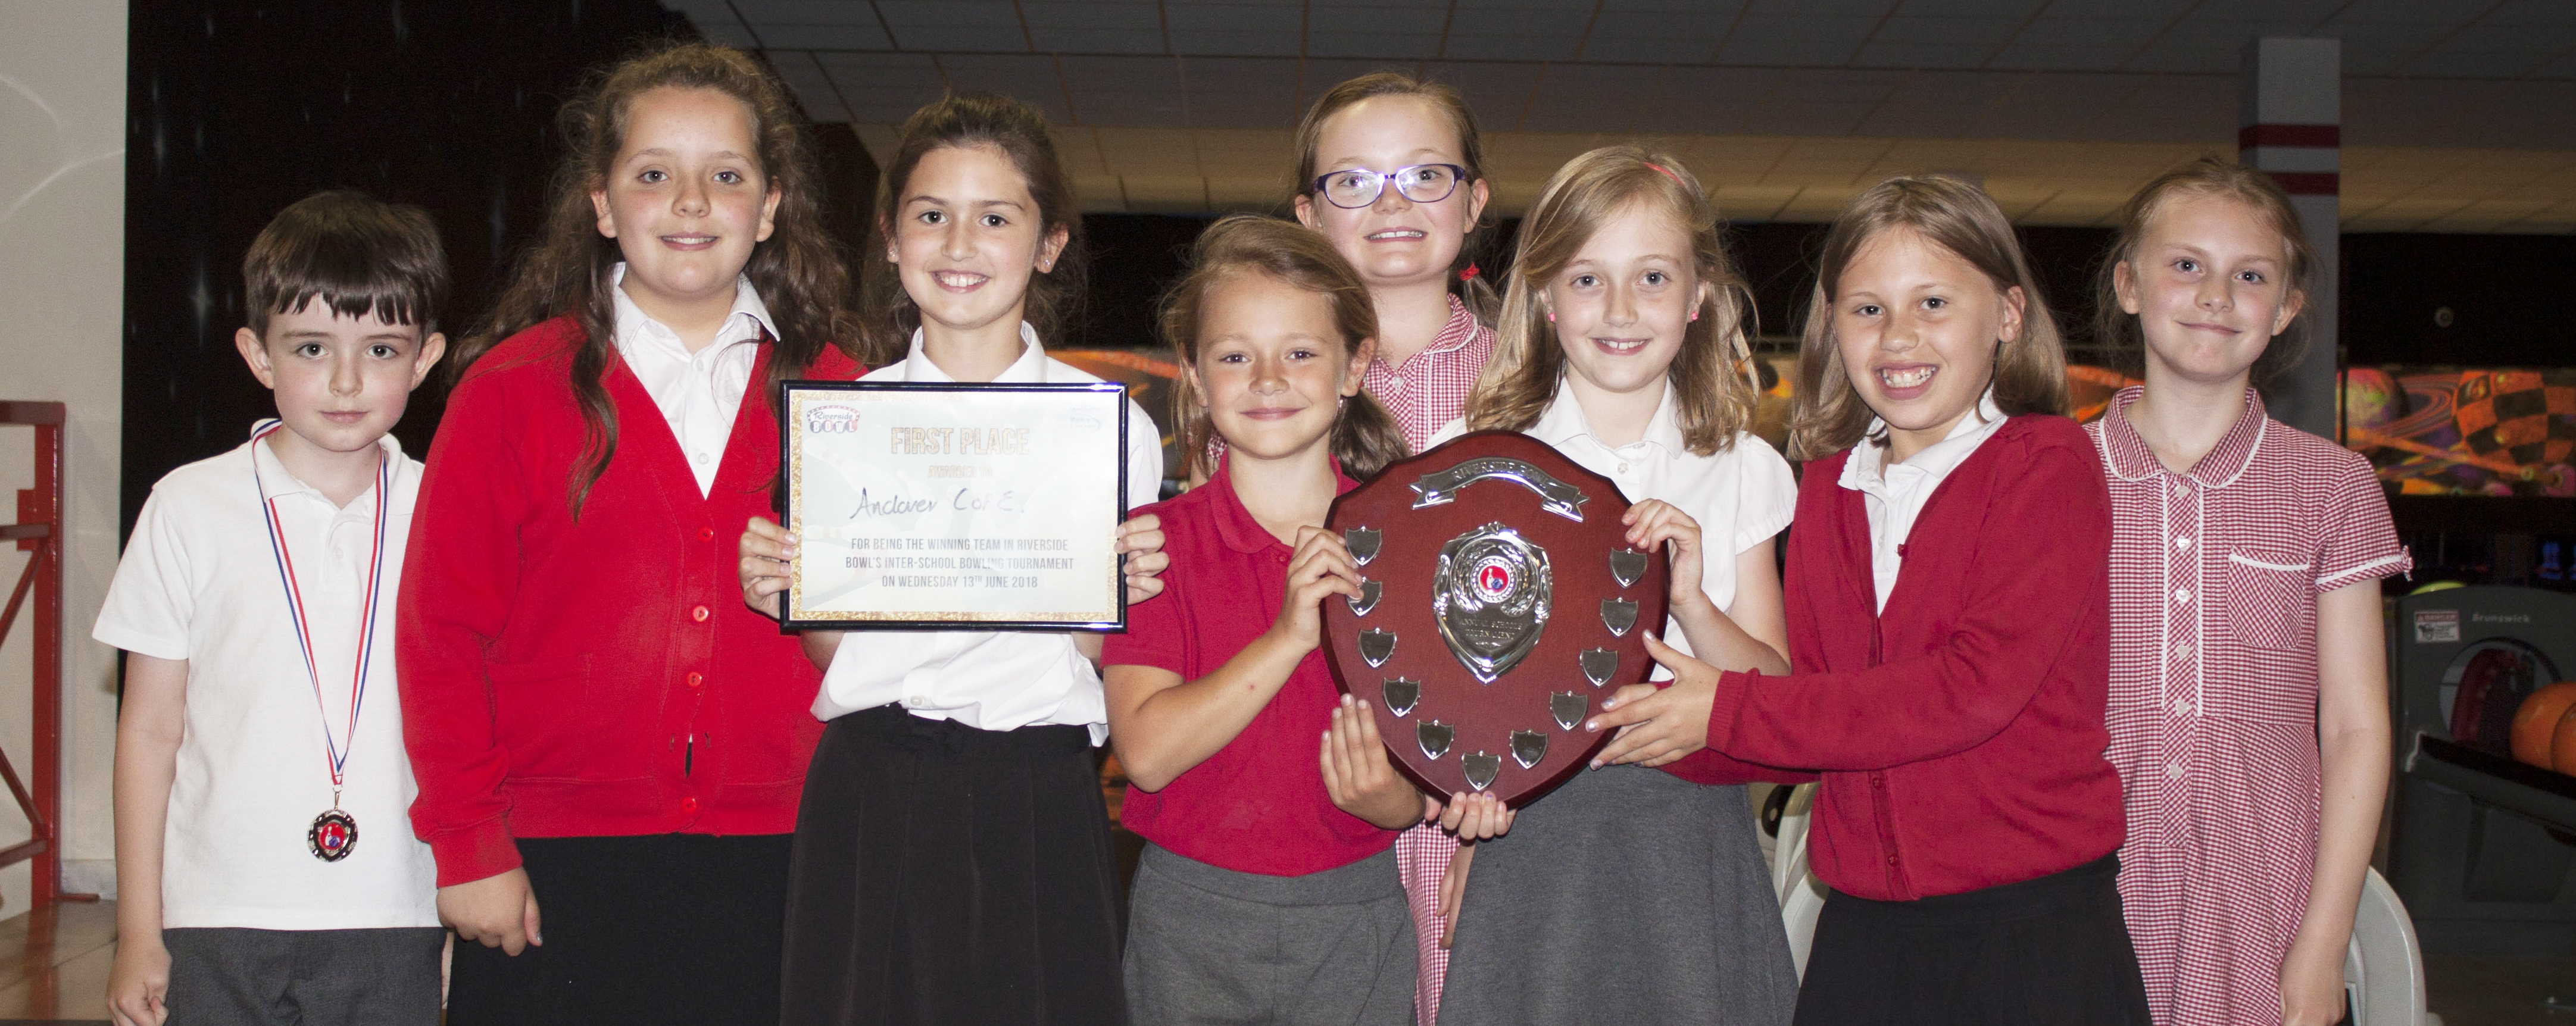 riverside bowl Inter School's Bowling Tournament. winners